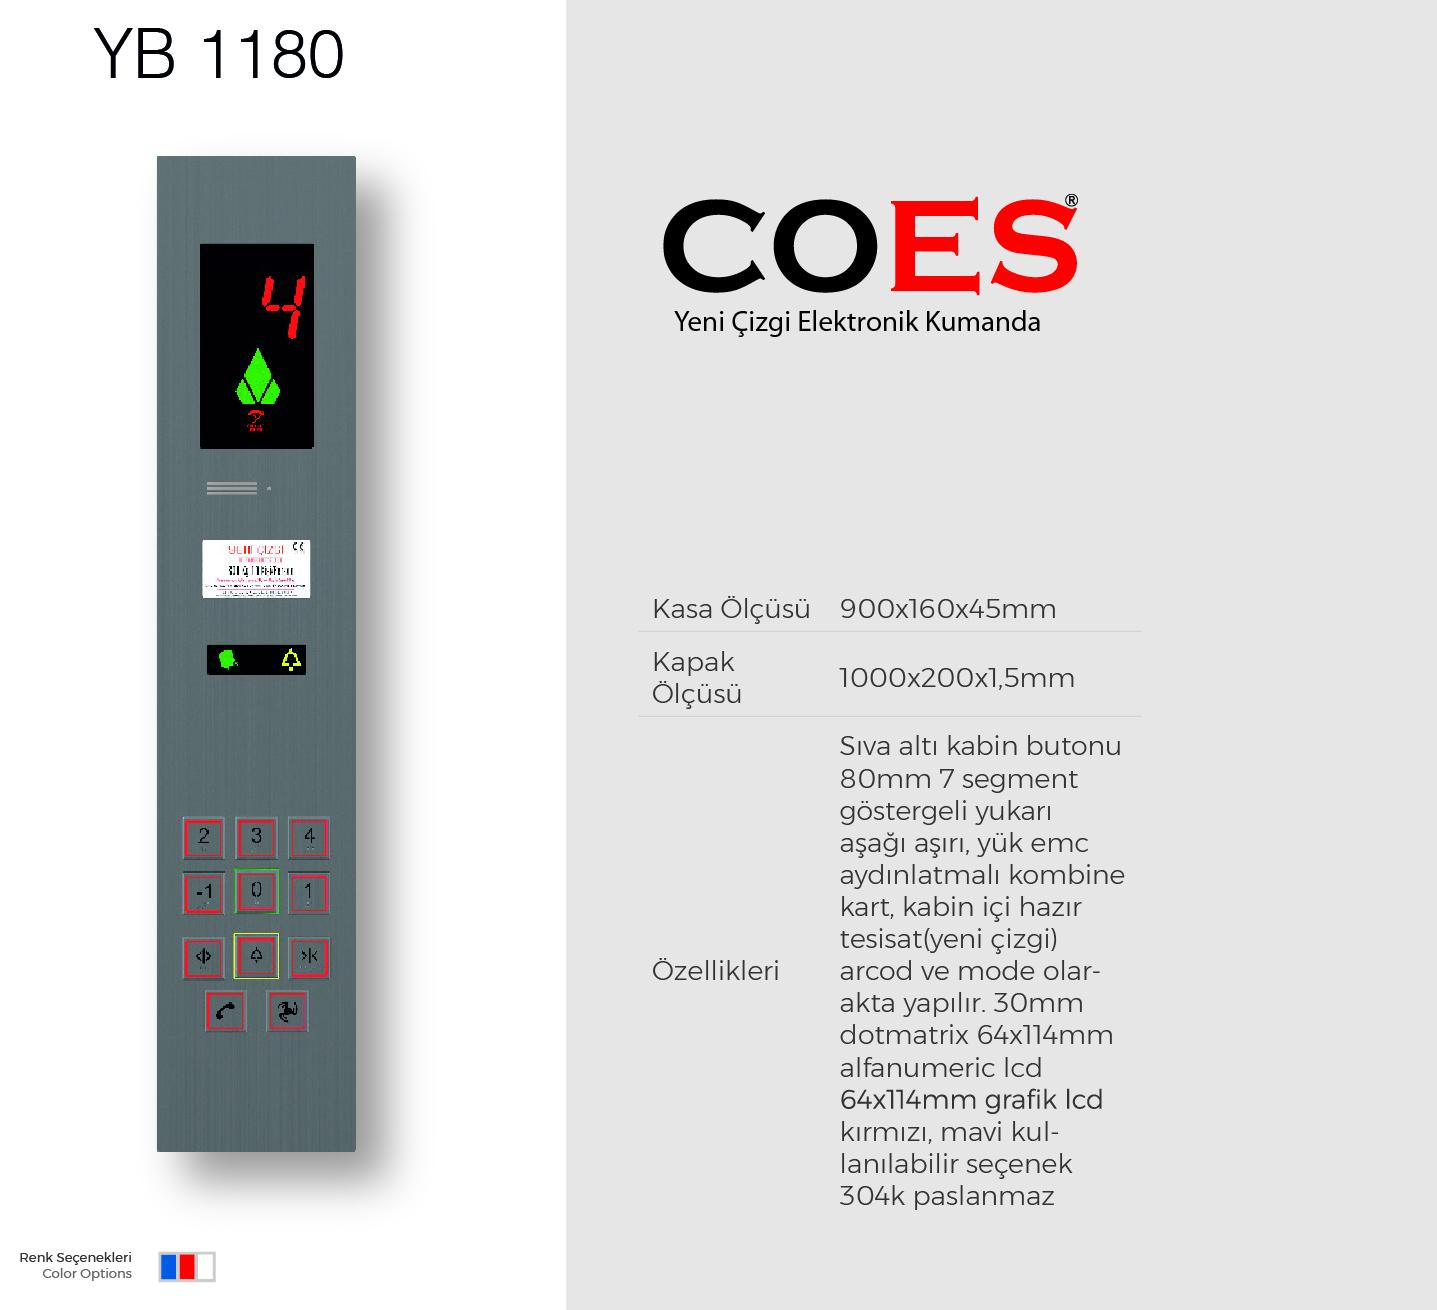 YB 1180